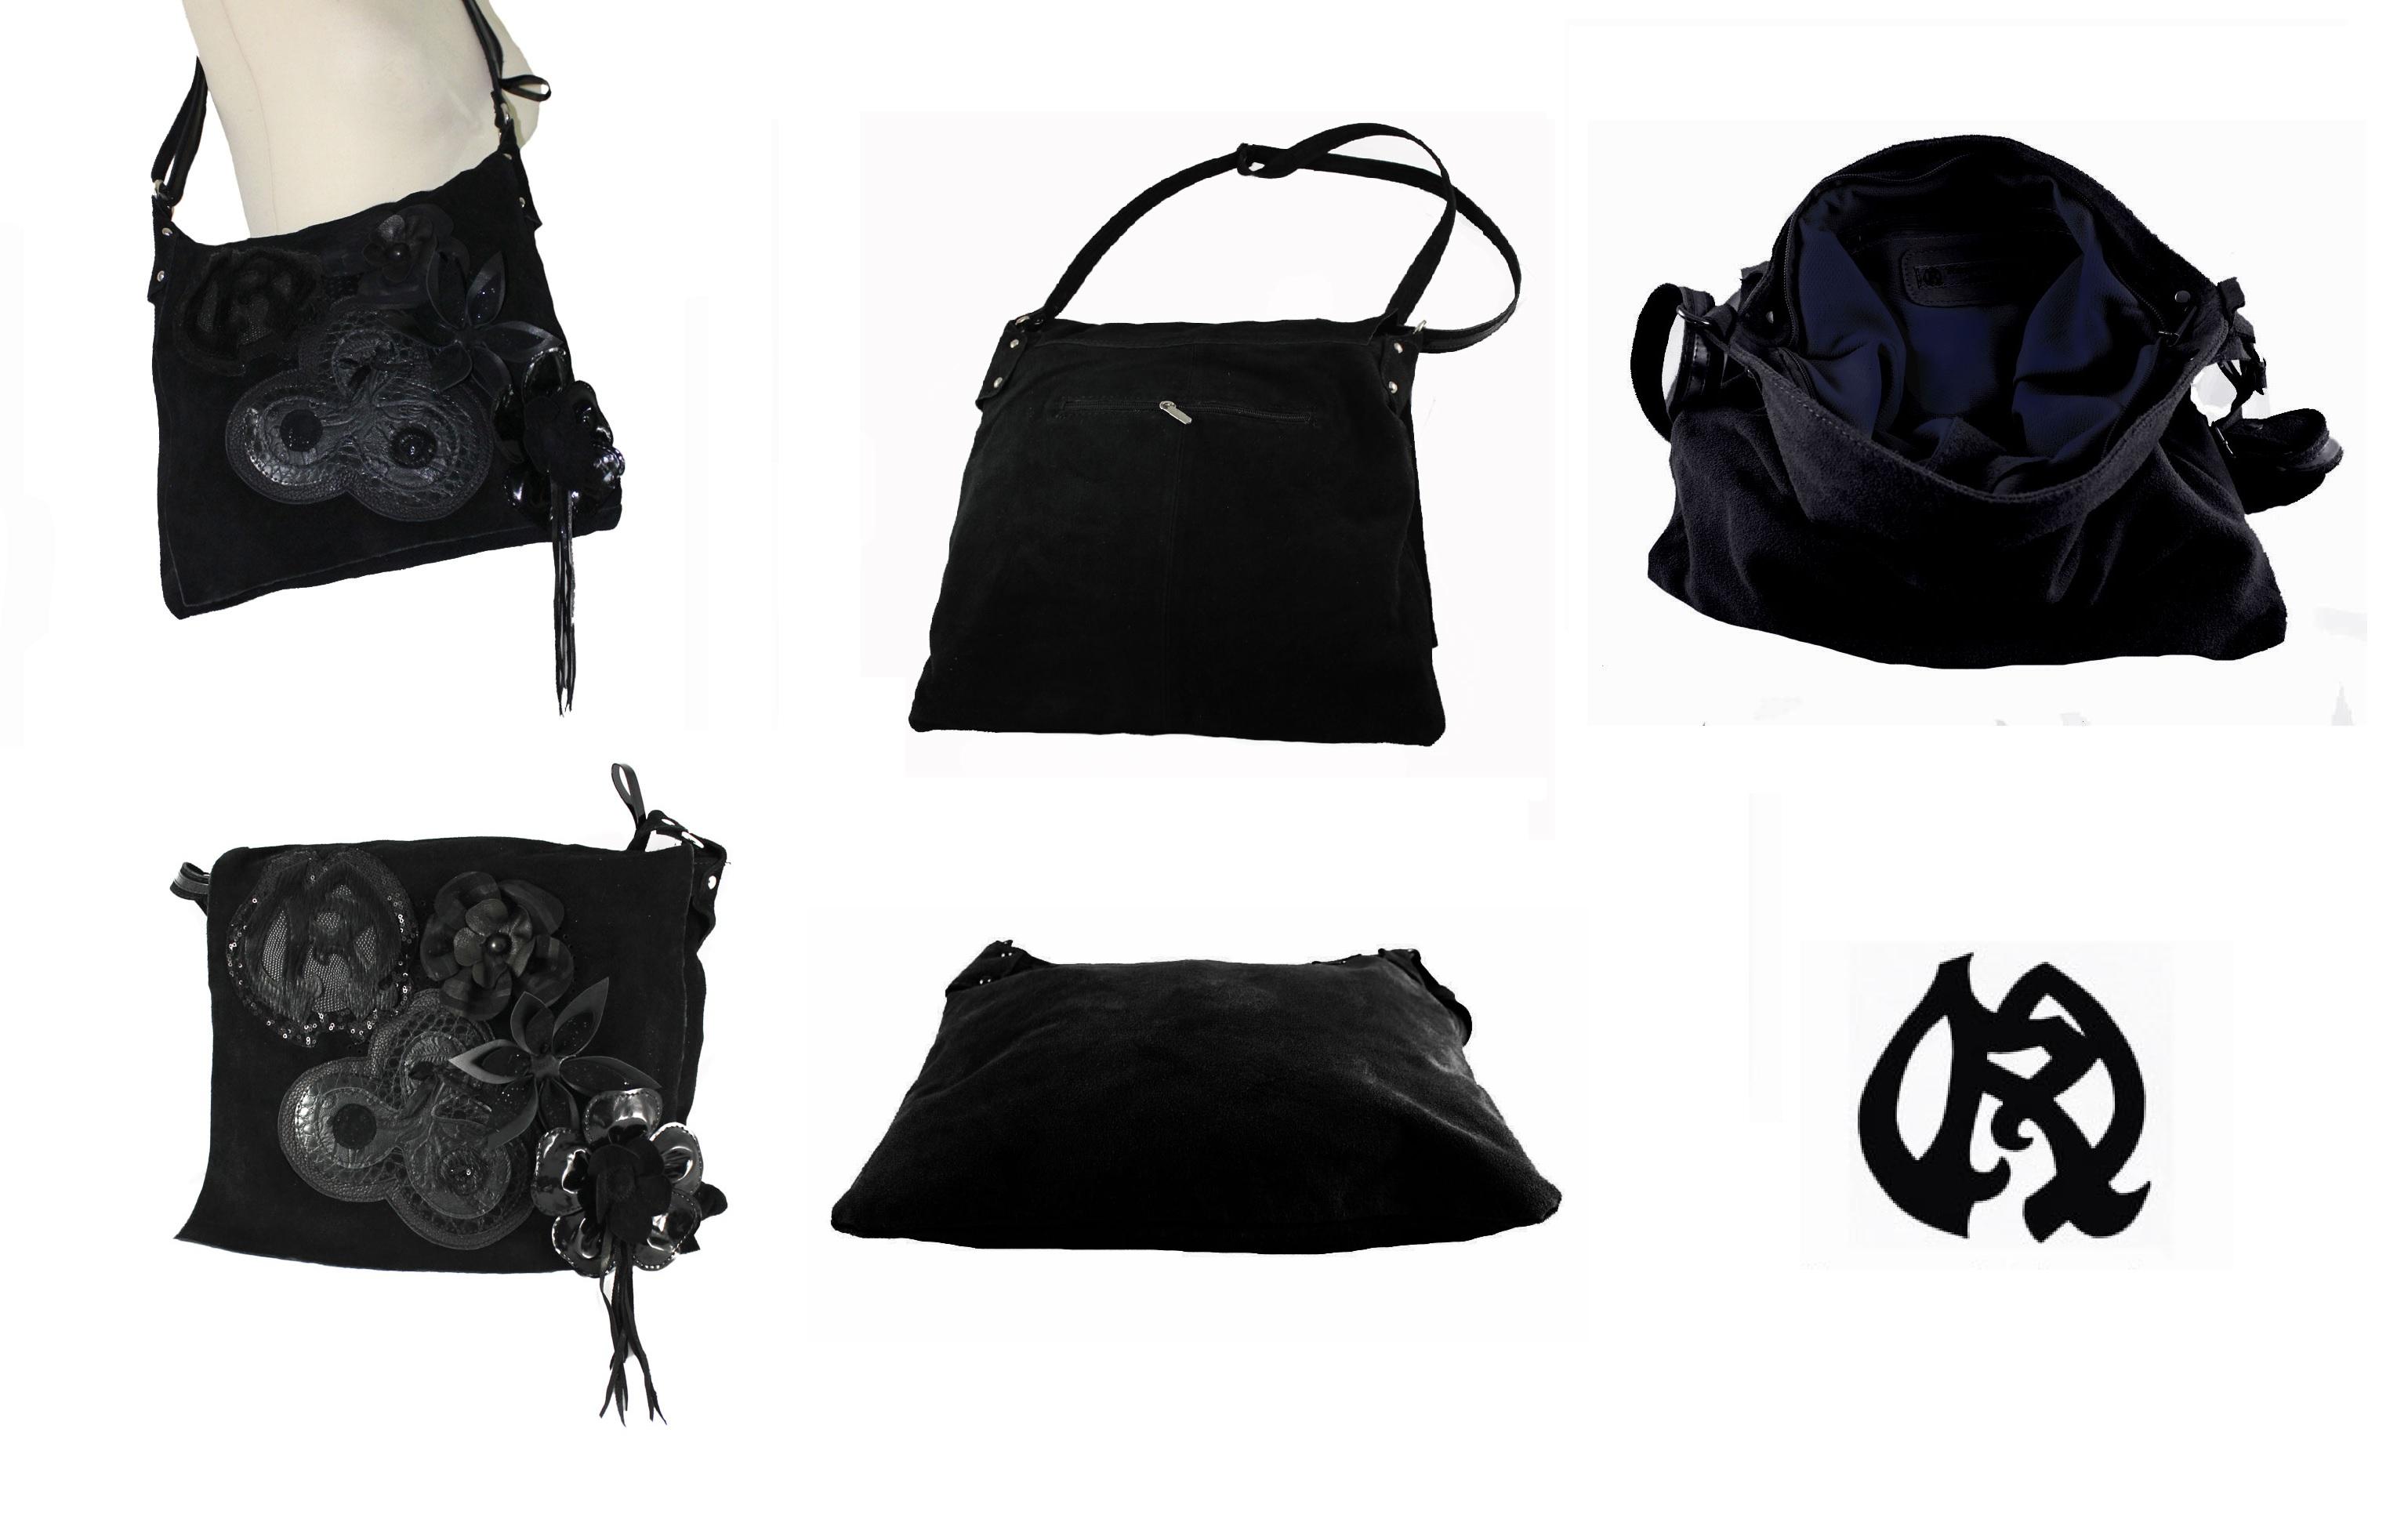 sac a main daim noir norma bunch blog. Black Bedroom Furniture Sets. Home Design Ideas